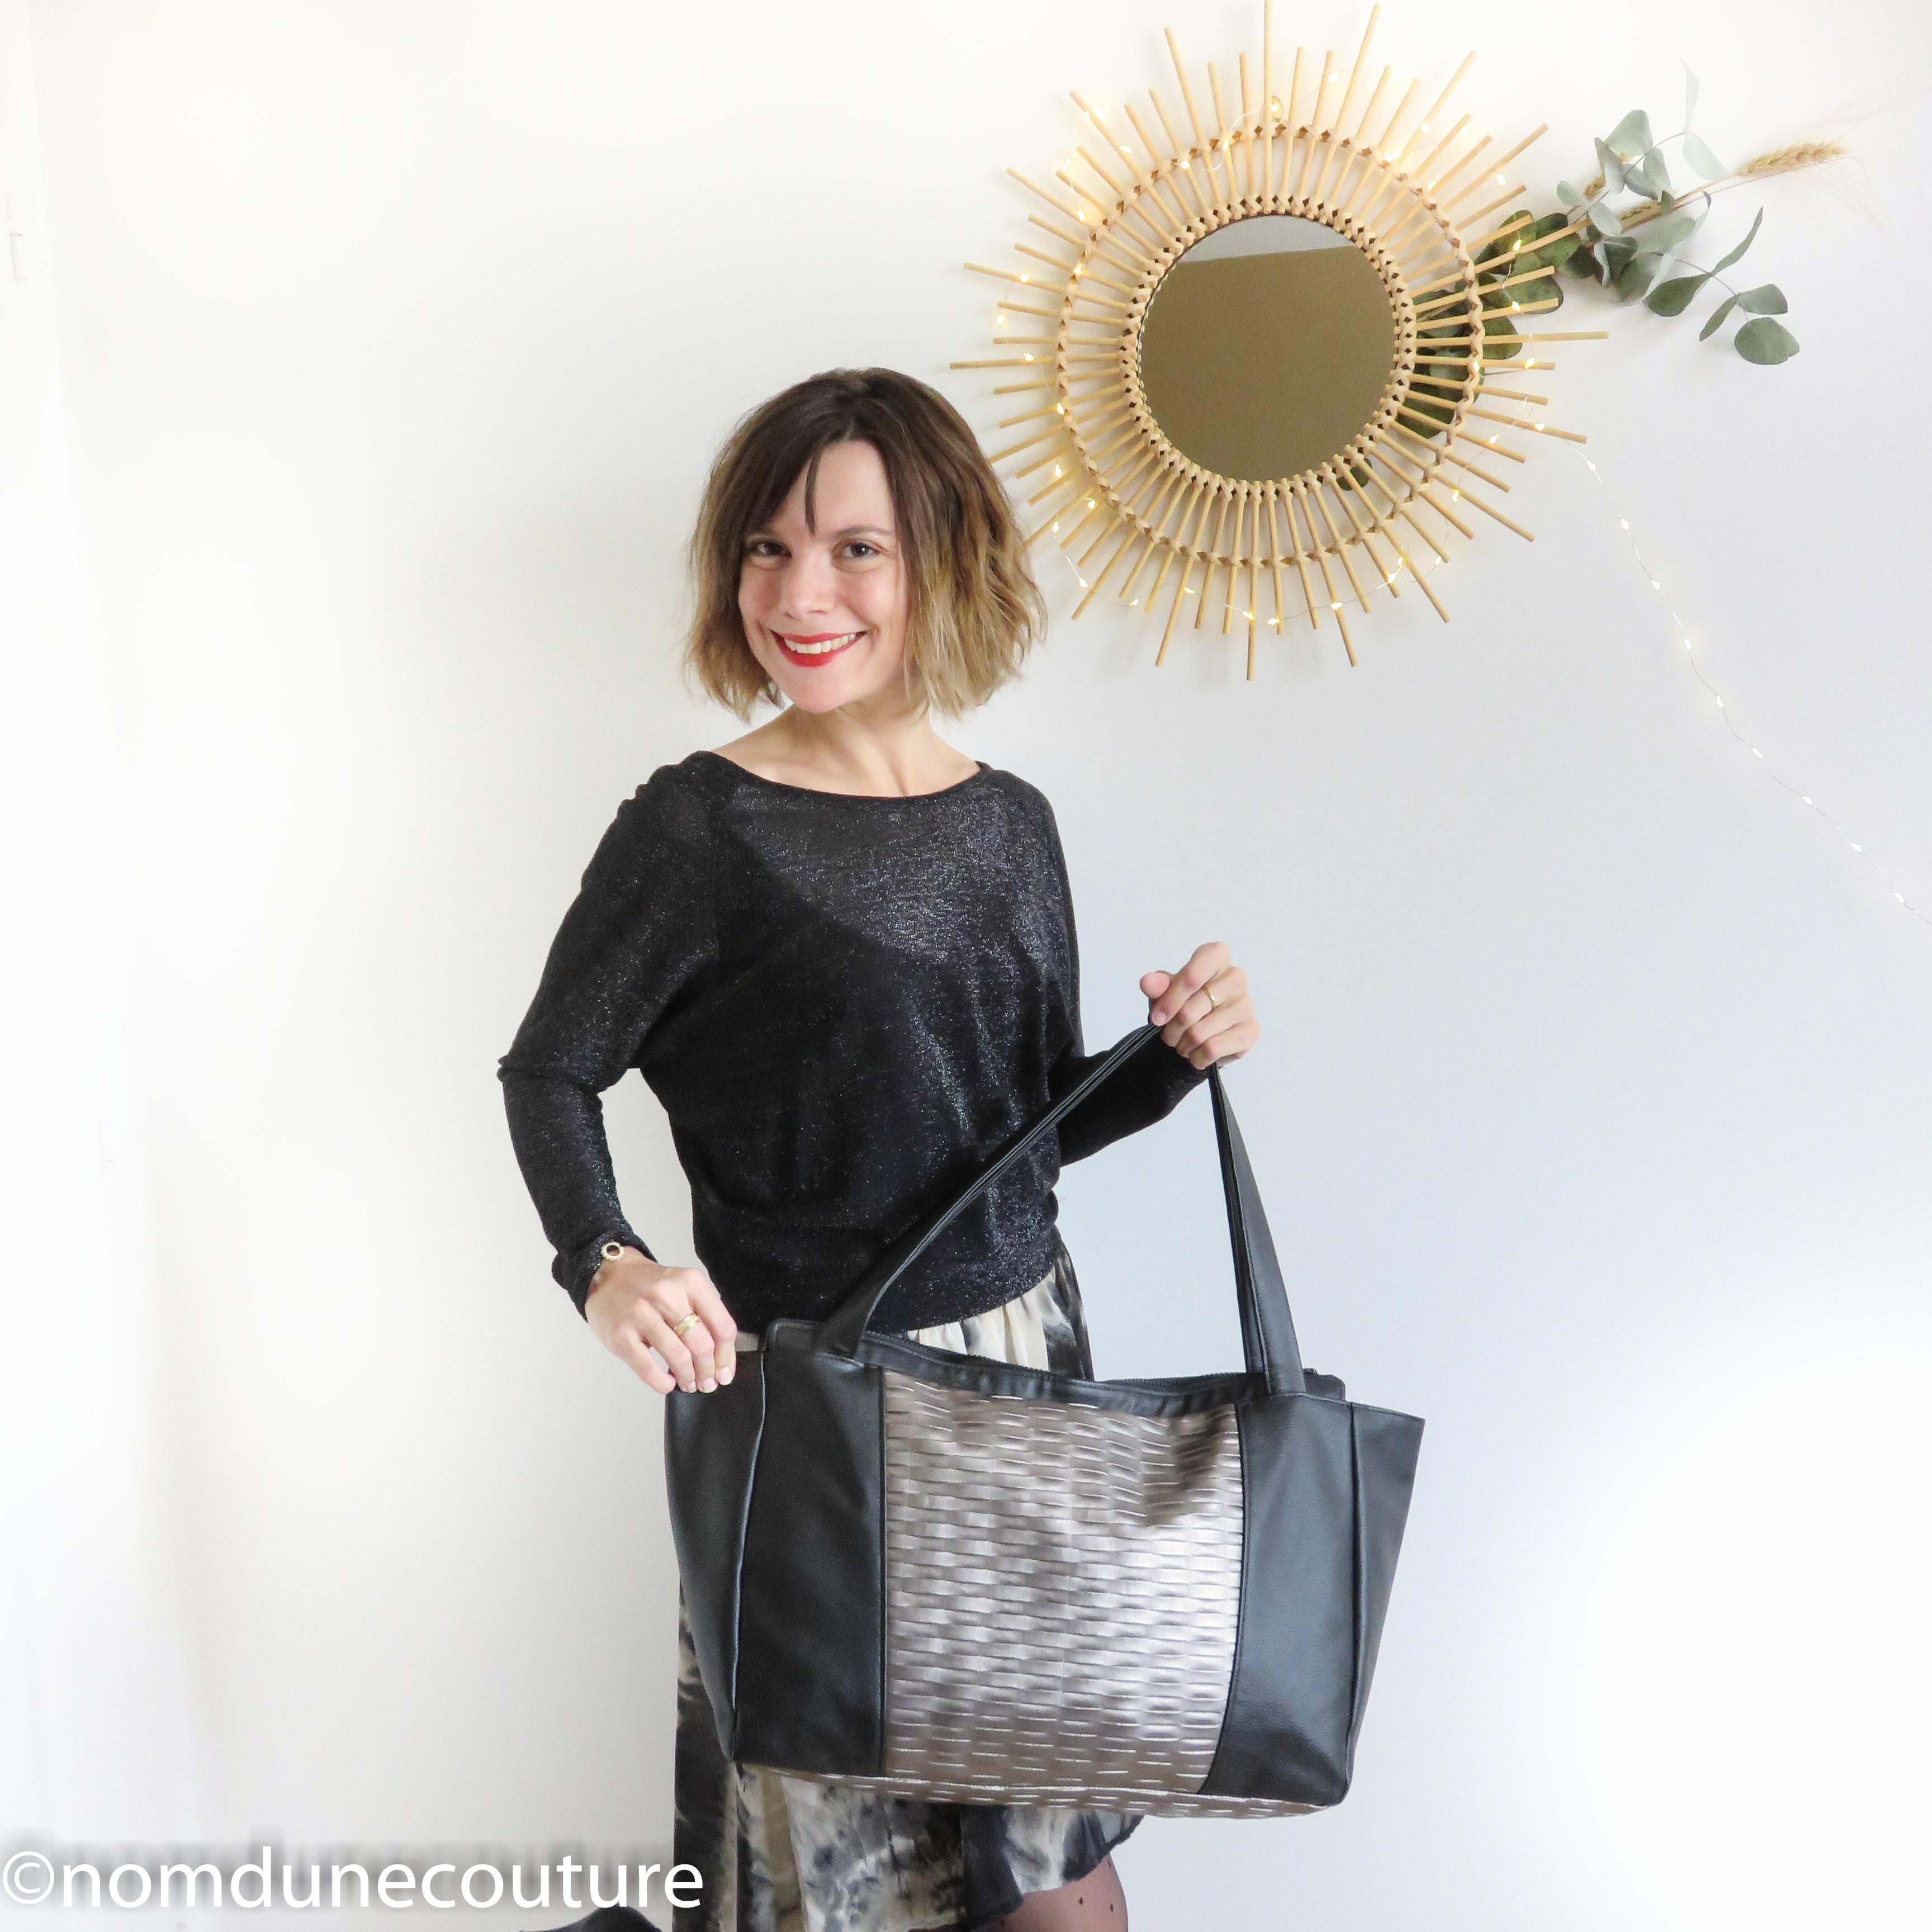 sac Emile petit patron couture